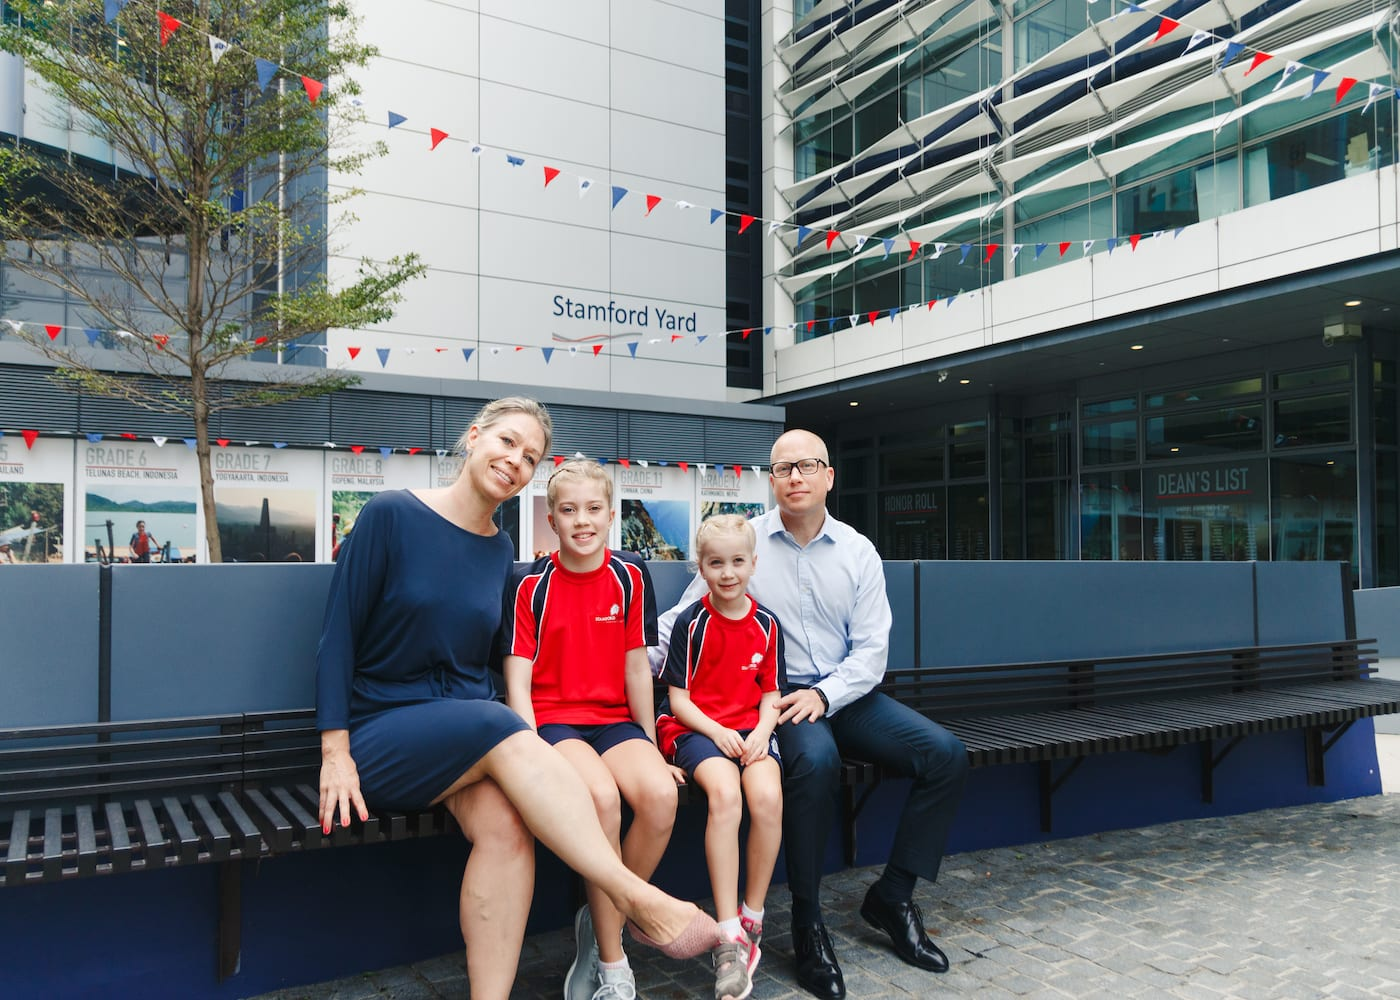 Charlotta Björn-Zanetti shares the amazing way Stamford American International School made her daughters feel welcome